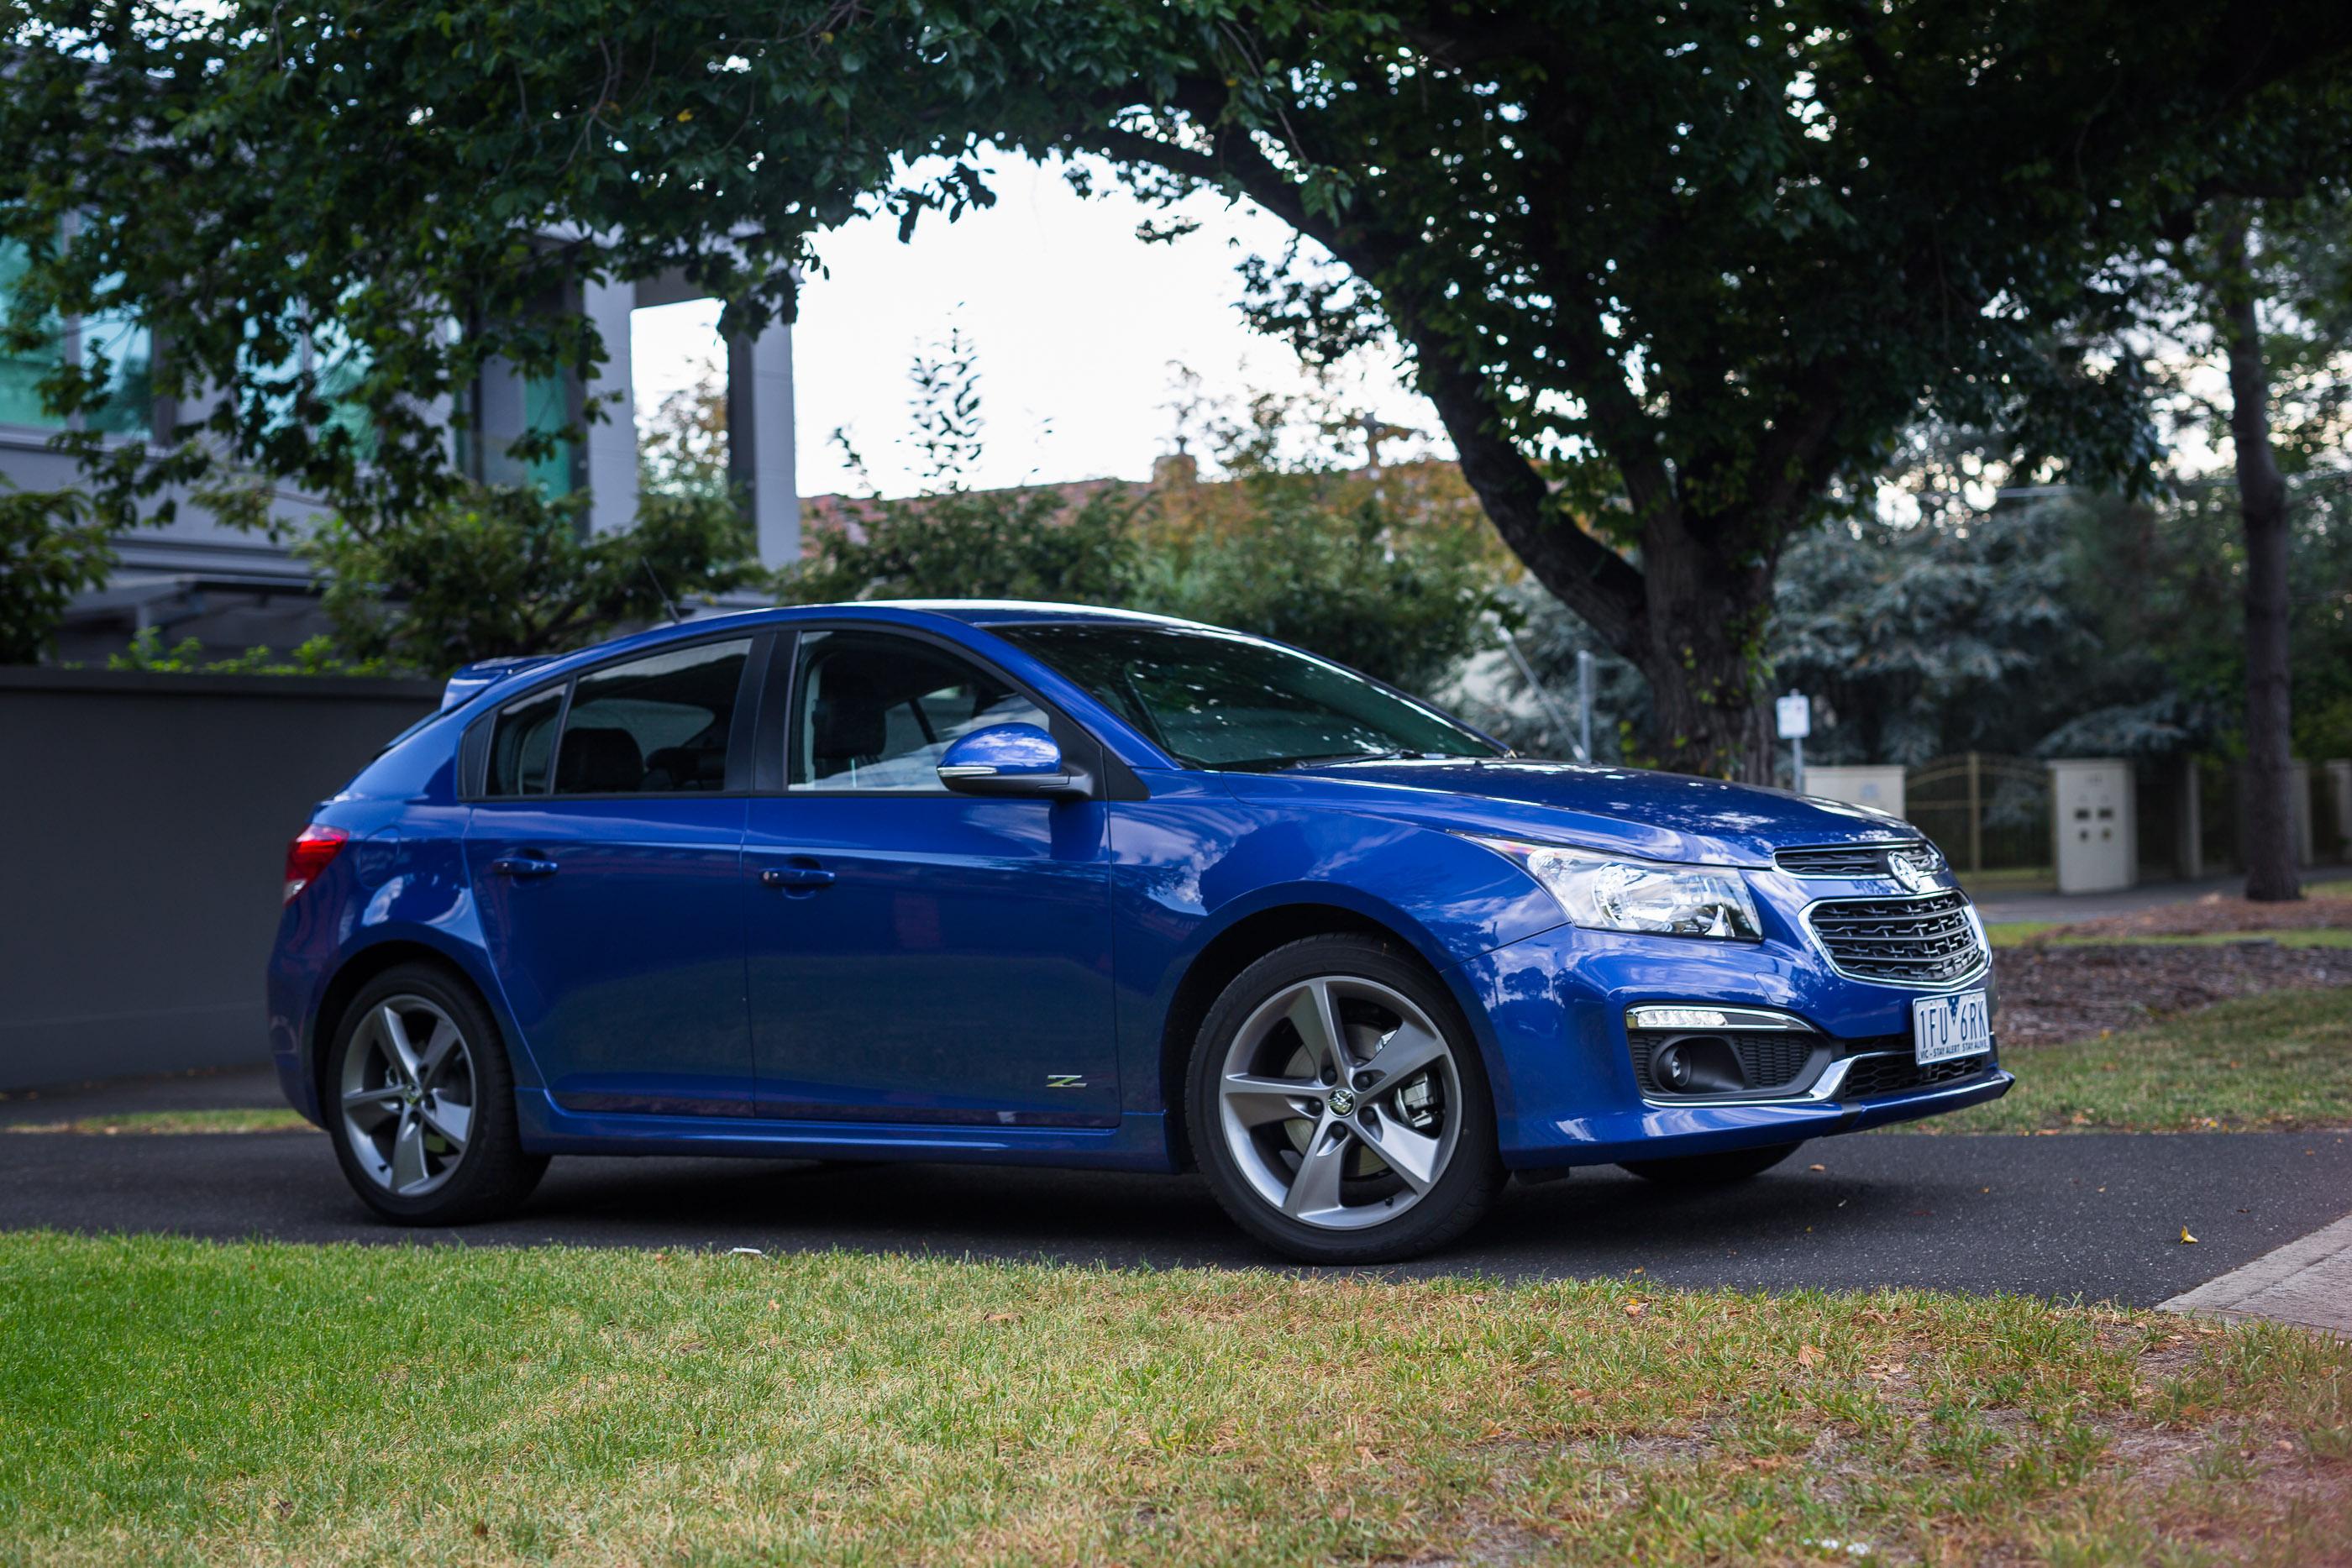 2016 Holden Cruze SRi Z-Series Hatch review - photos ...